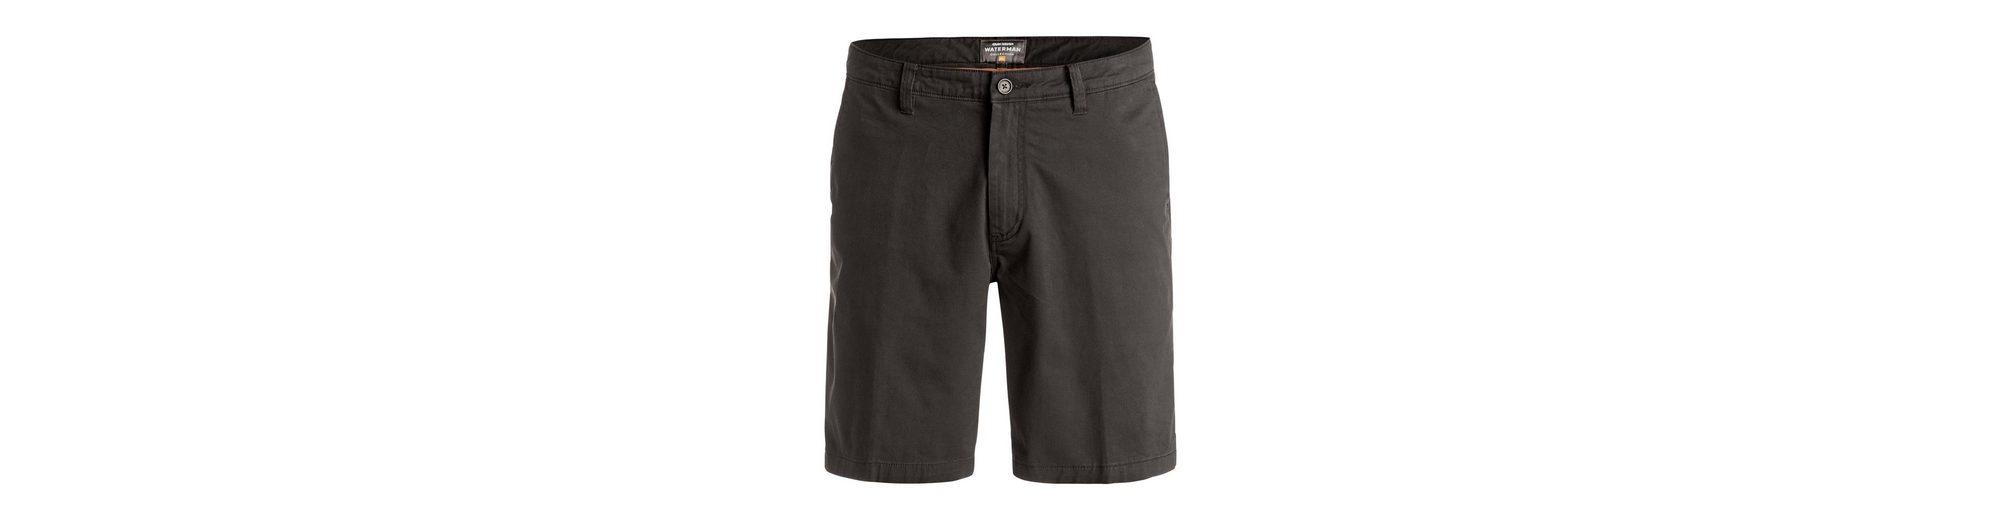 Quiksilver Shorts Pakala - Shorts Spielraum Footlocker tI8T1CqET